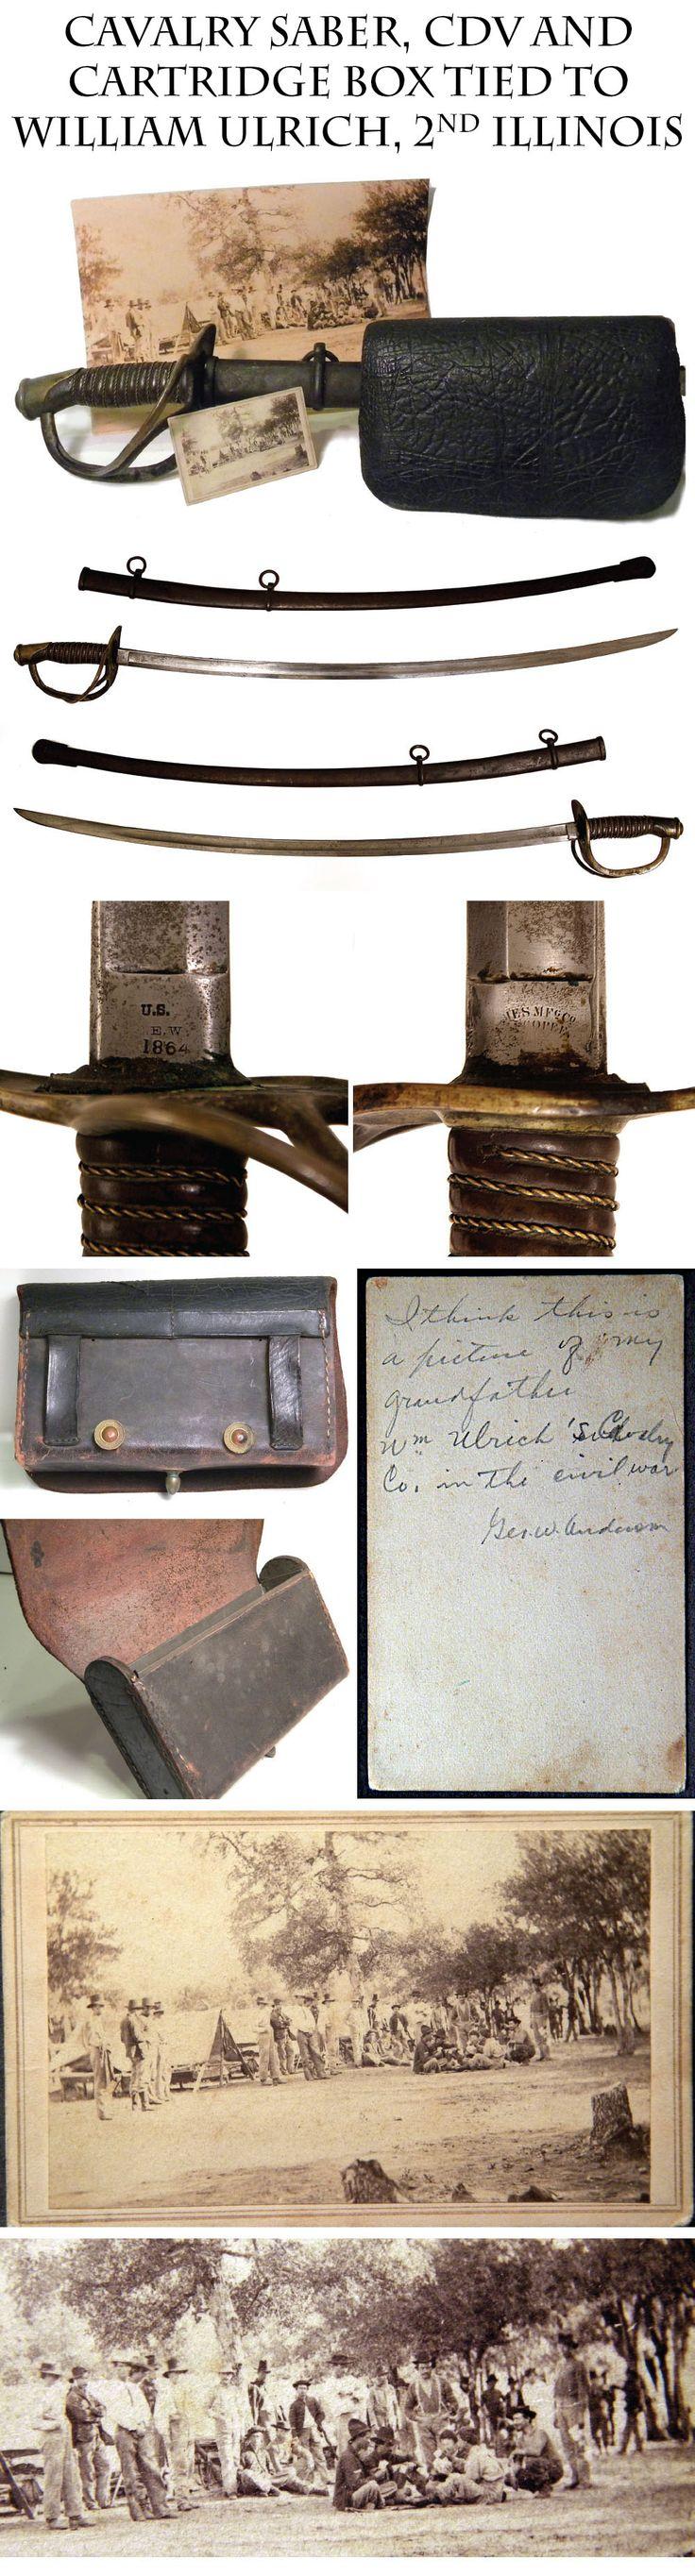 Civil War Antiques (Dave Taylor's) December 2013 Webcatalog